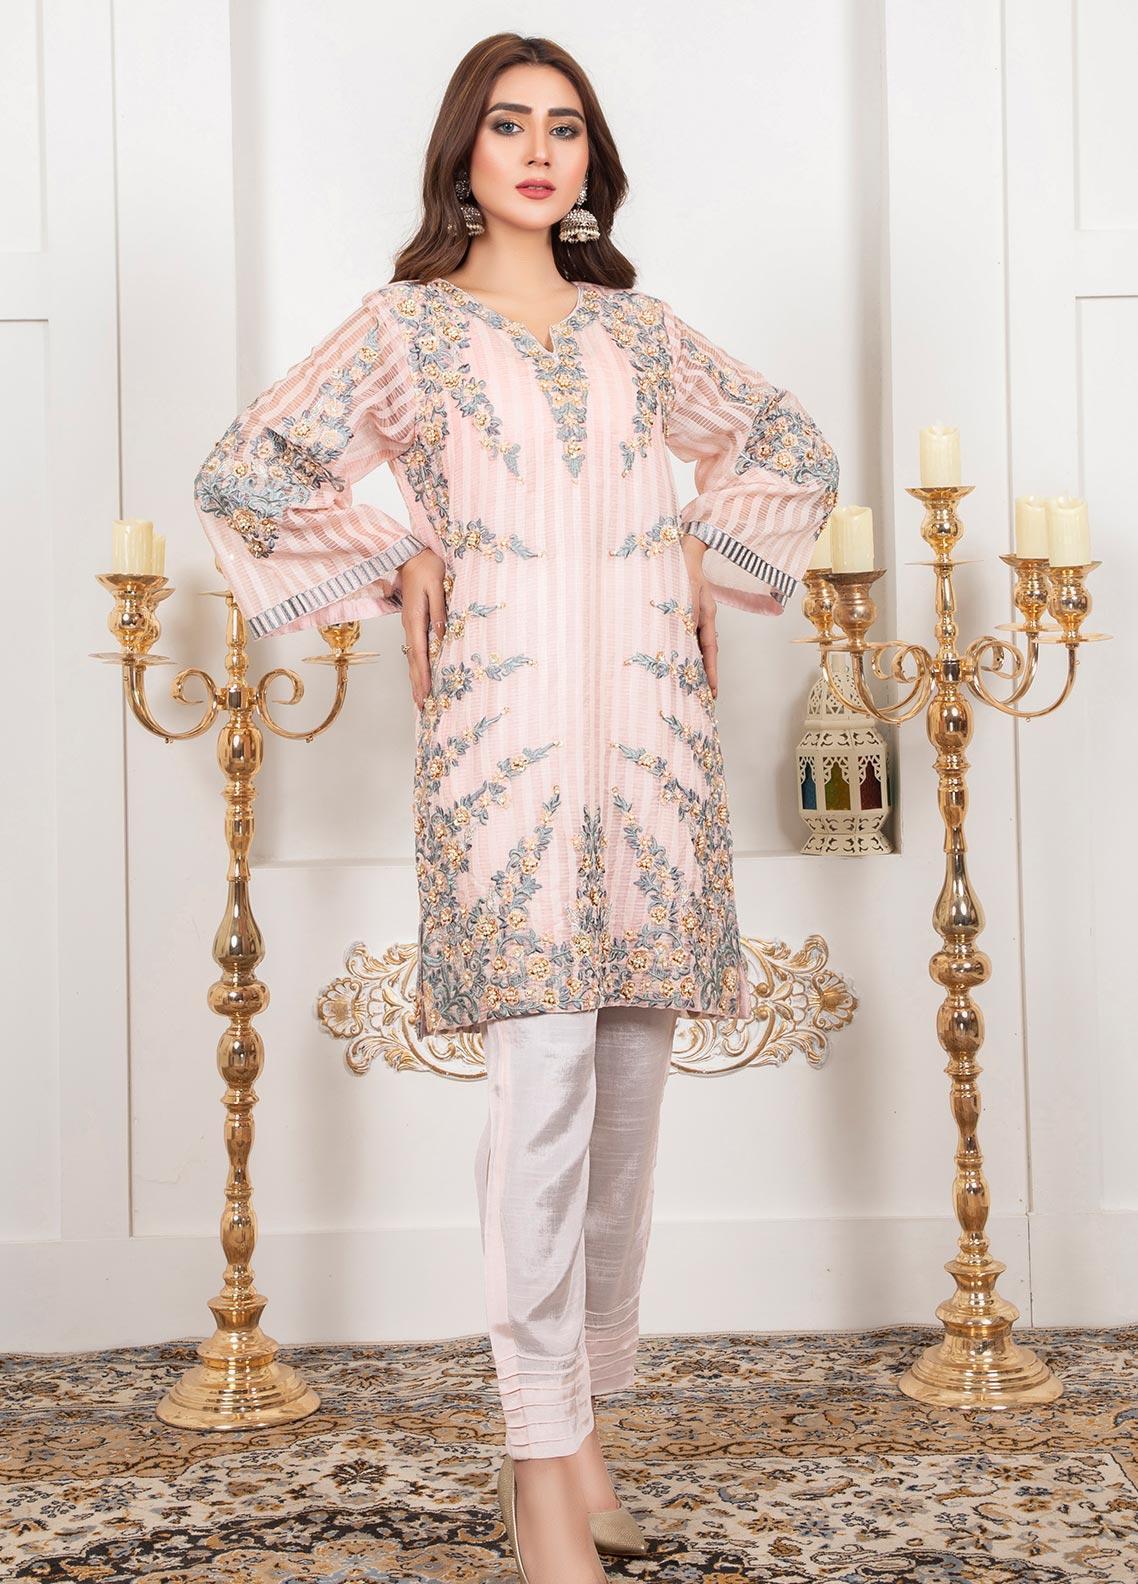 Lush Embroidered Organza Stitched Shirt 07 Flamingo